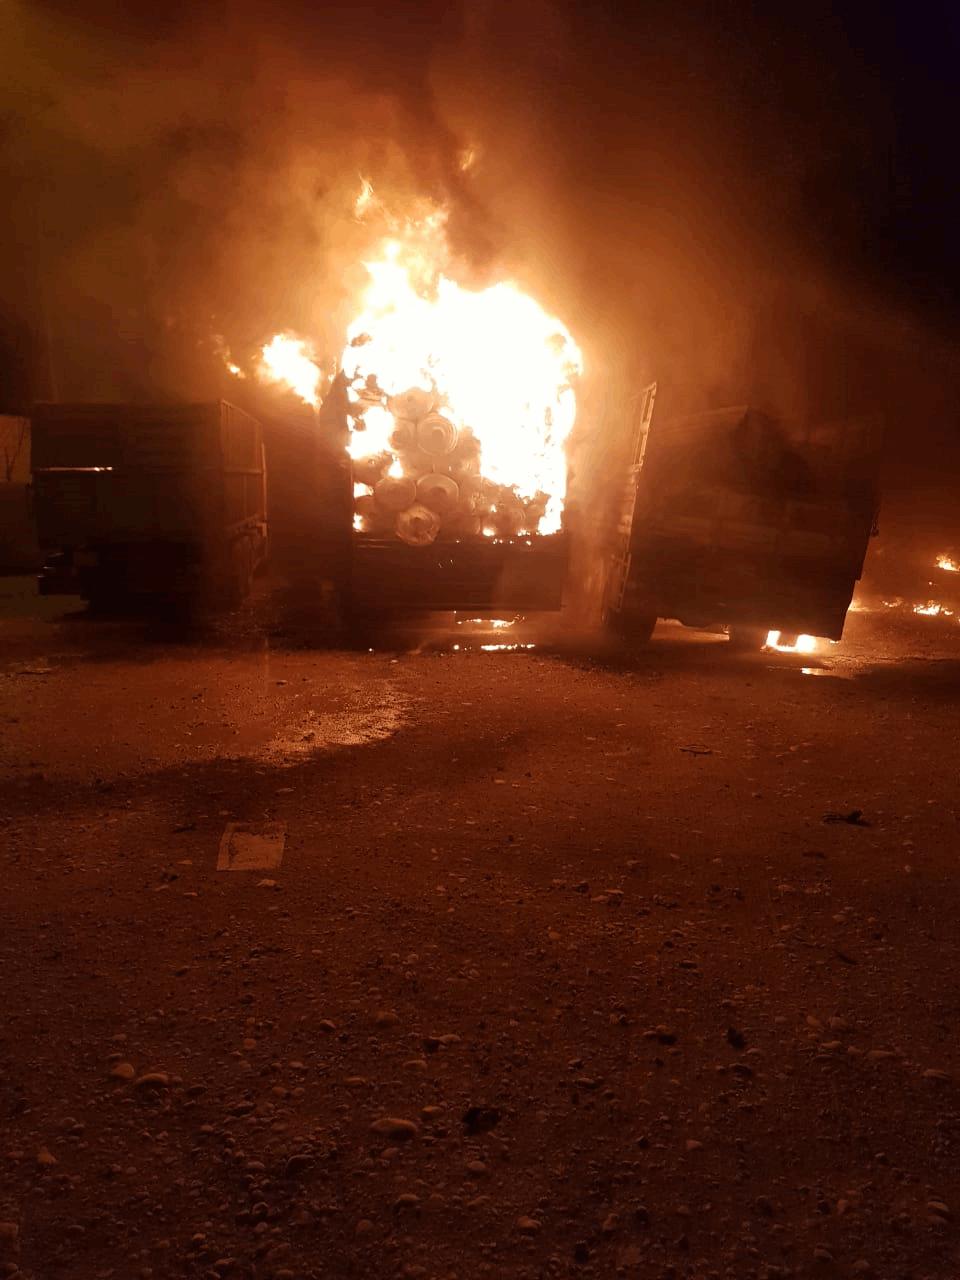 حرق 6 شاحنات في منفذ عراقي في واسط مع ايران